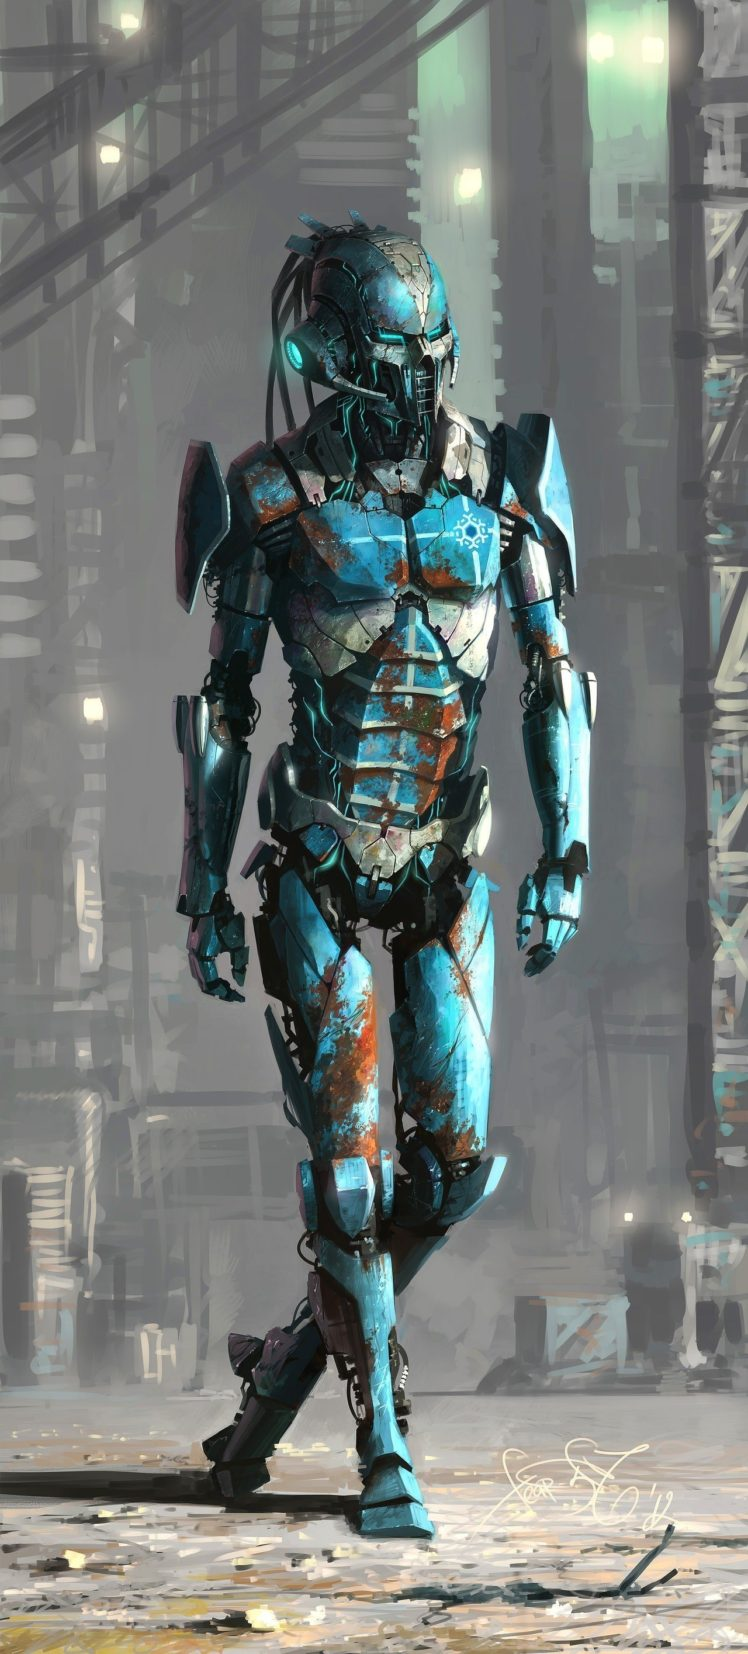 robot, Mortal Kombat X, Mortal Kombat, Sub Zero HD Wallpaper Desktop Background